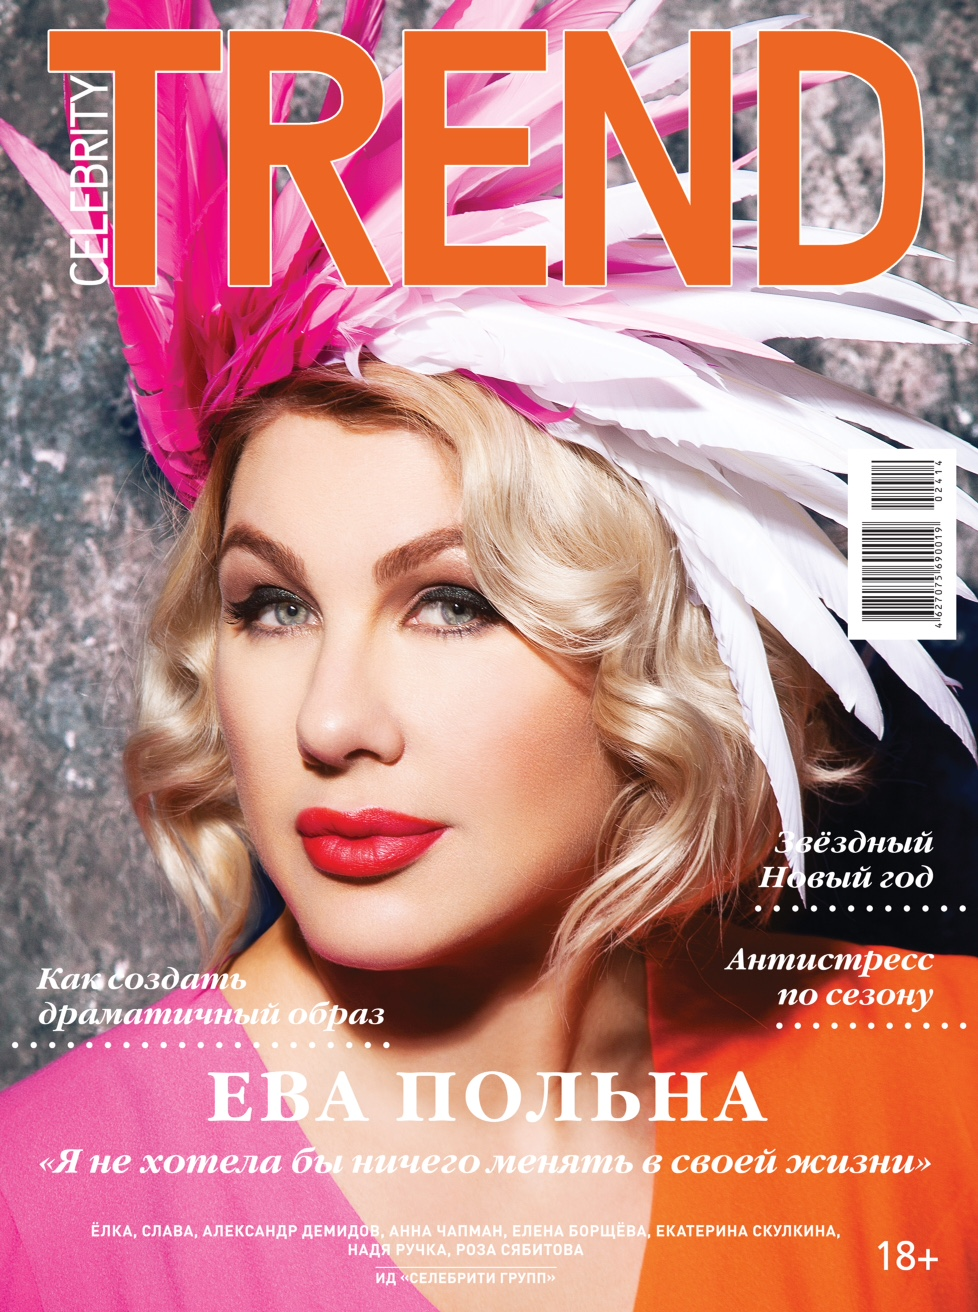 CELEBRITY_TREND_oblozhka_24.indd